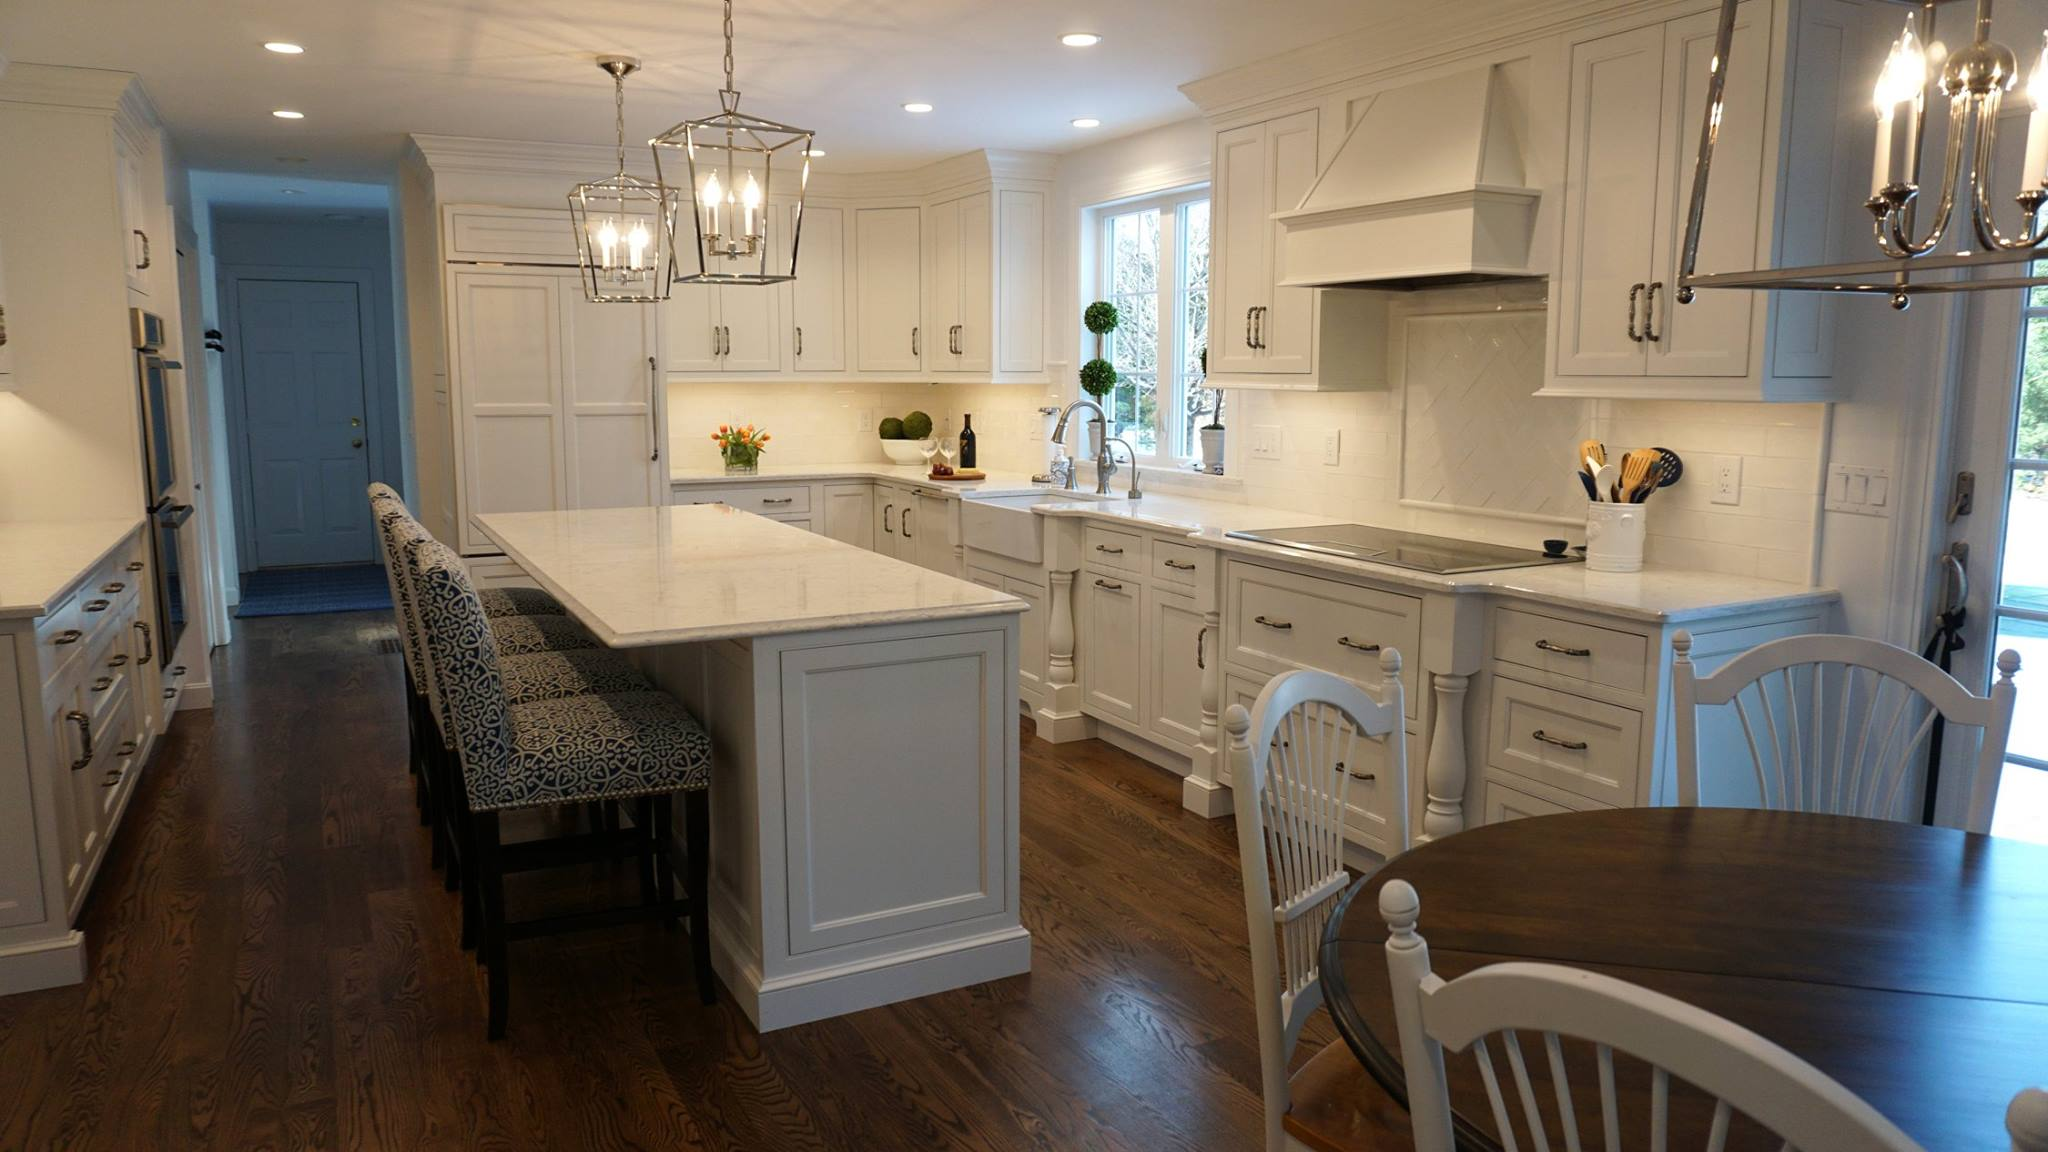 Custom Light Fixtures & Residential Interior Designer